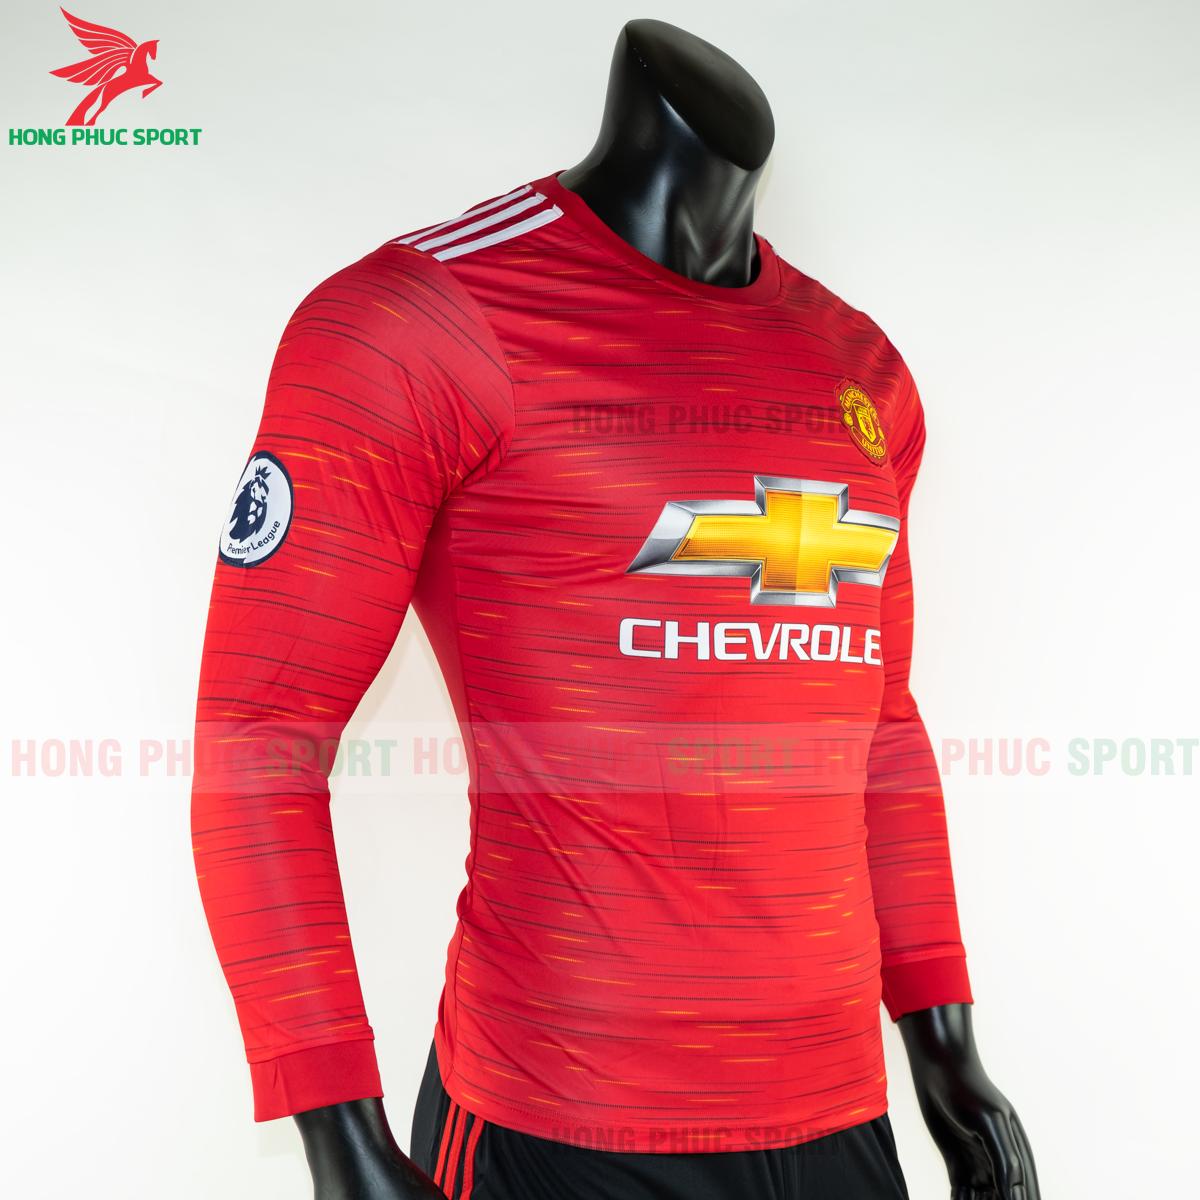 https://cdn.hongphucsport.com/unsafe/s4.shopbay.vn/files/285/ao-dai-tay-manchester-united-2020-san-nha-5-5f8fdd3e4fc66.png